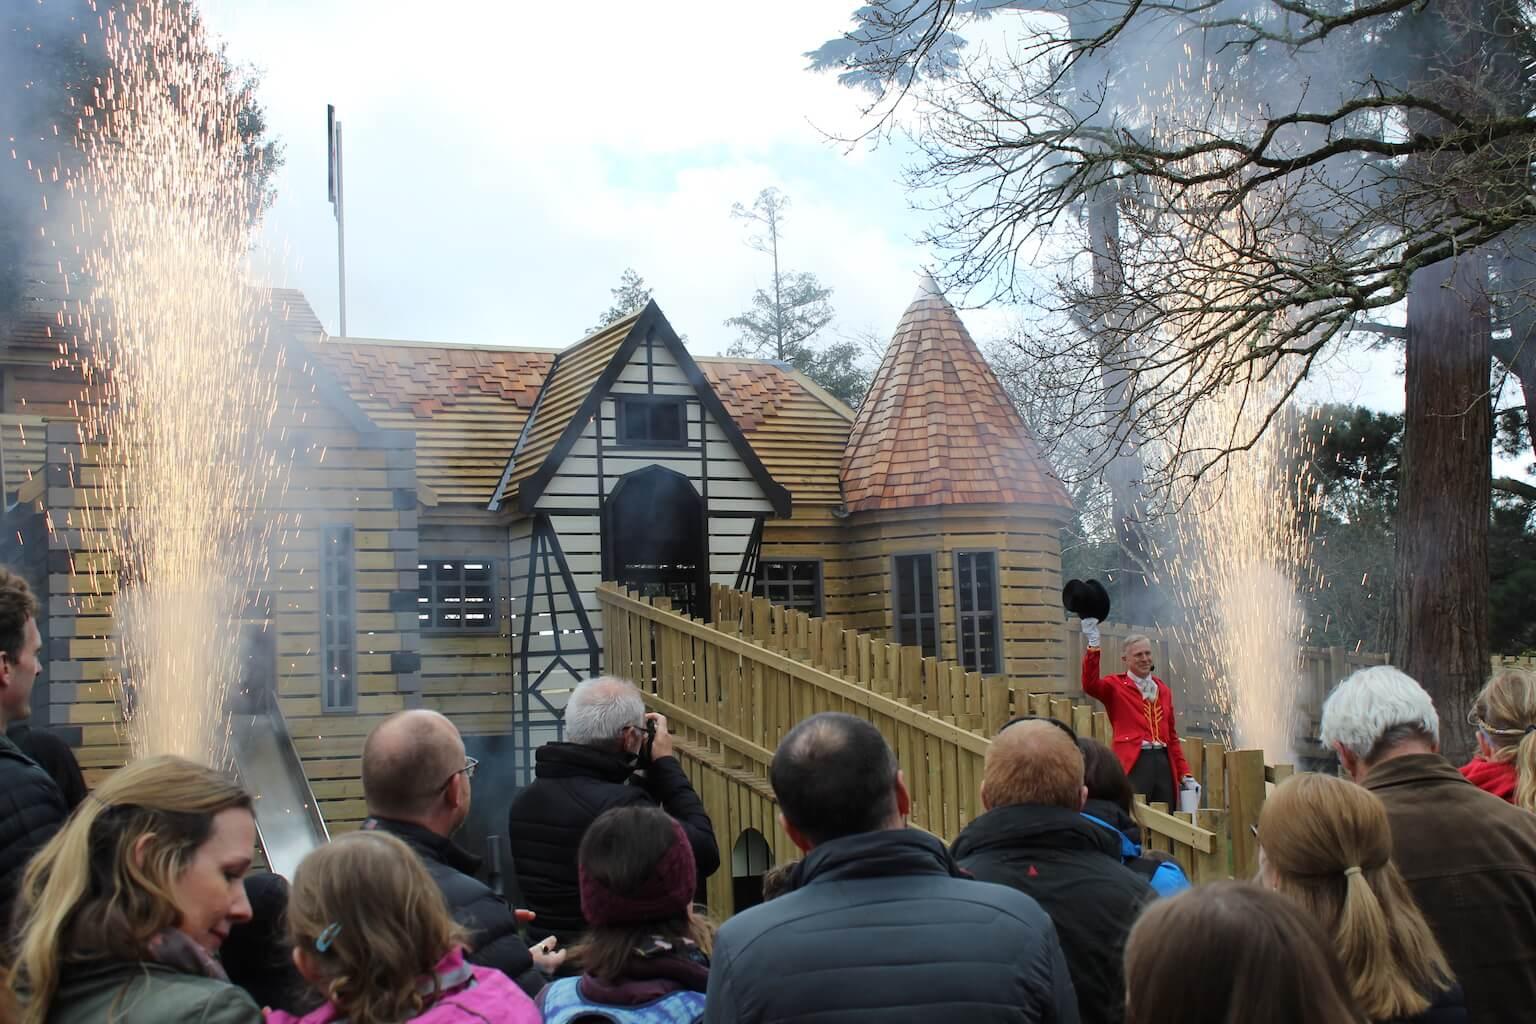 The pyrotechnics mark Little Beaulieu as open copy